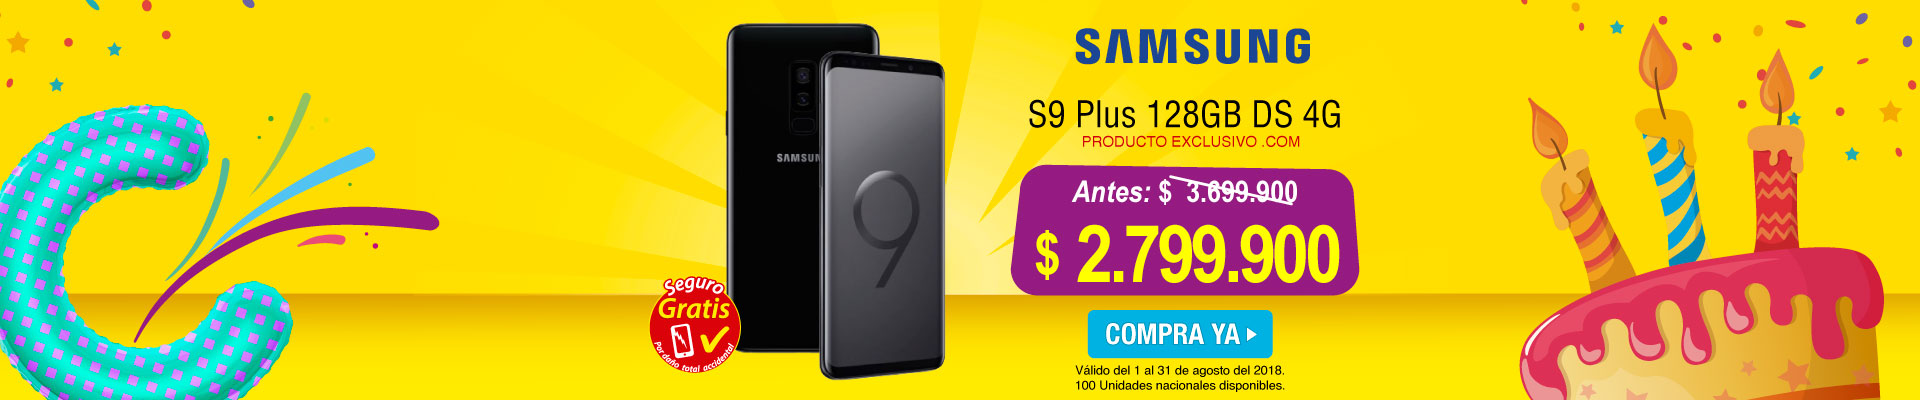 ALKP-PPAL-5-TV-PP---Samsung-S9PLUS4GDS-Ago15